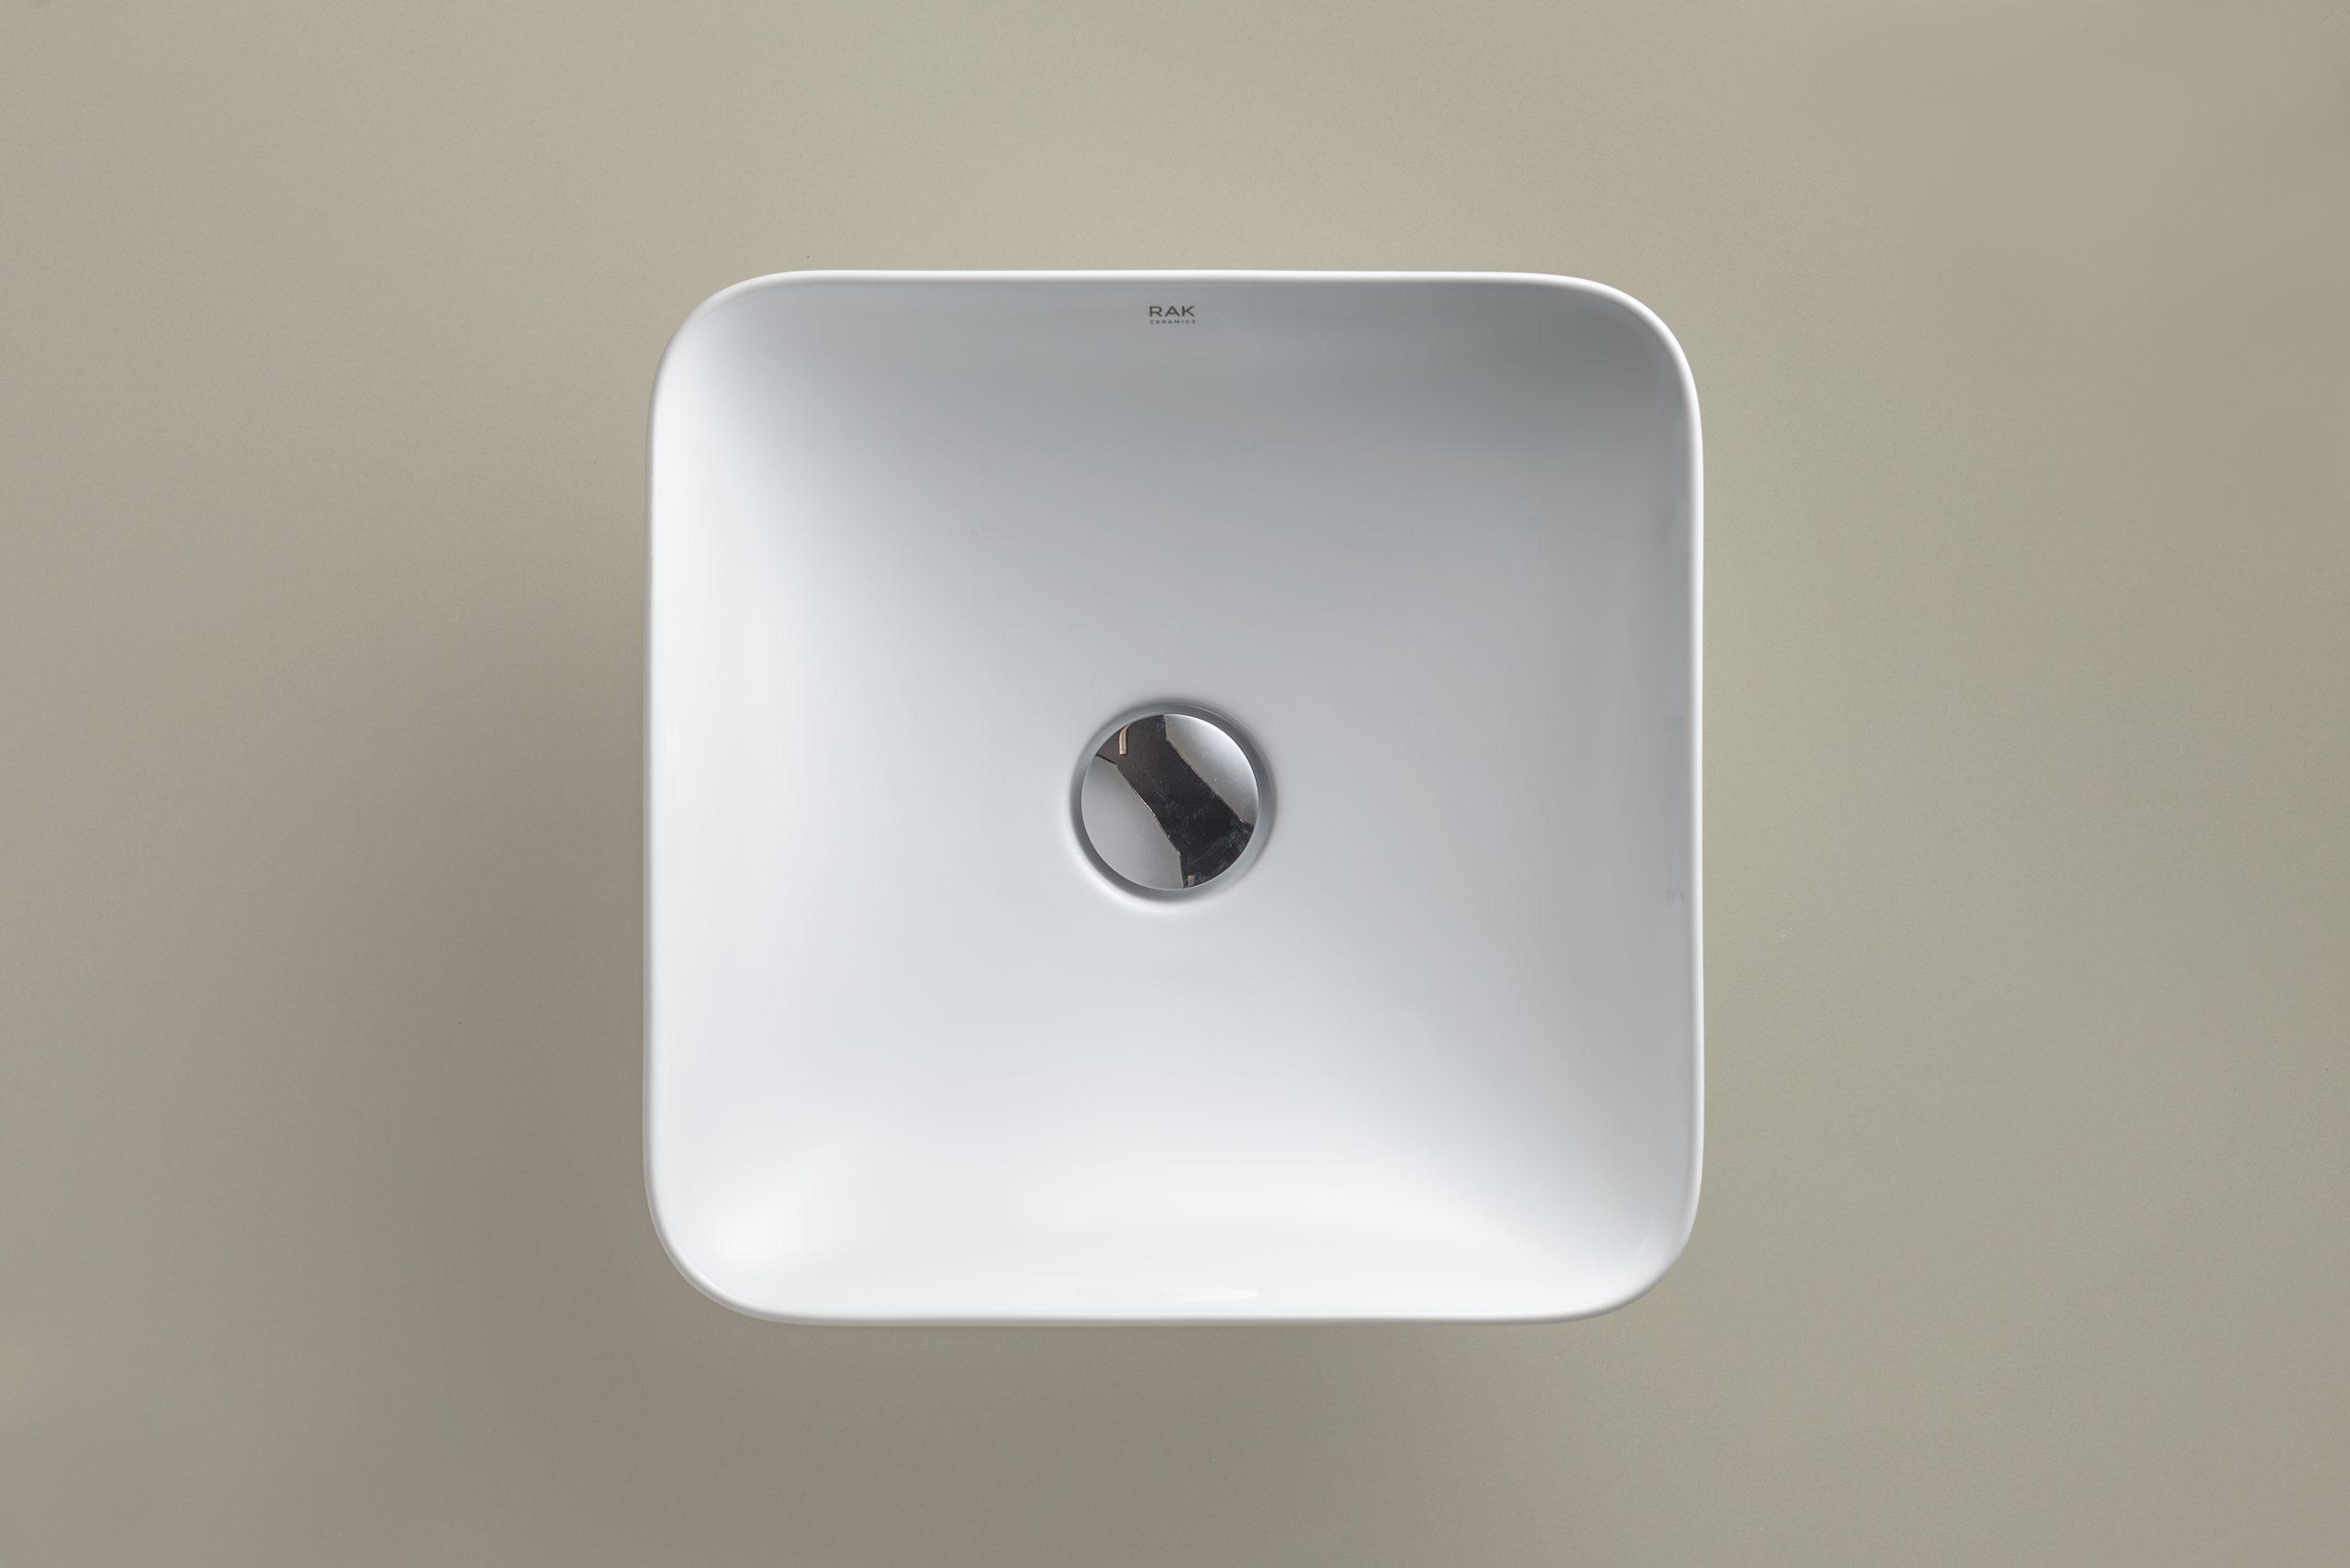 Square Variant washbasins designed by Debiasi Sandri for RAK Ceramics